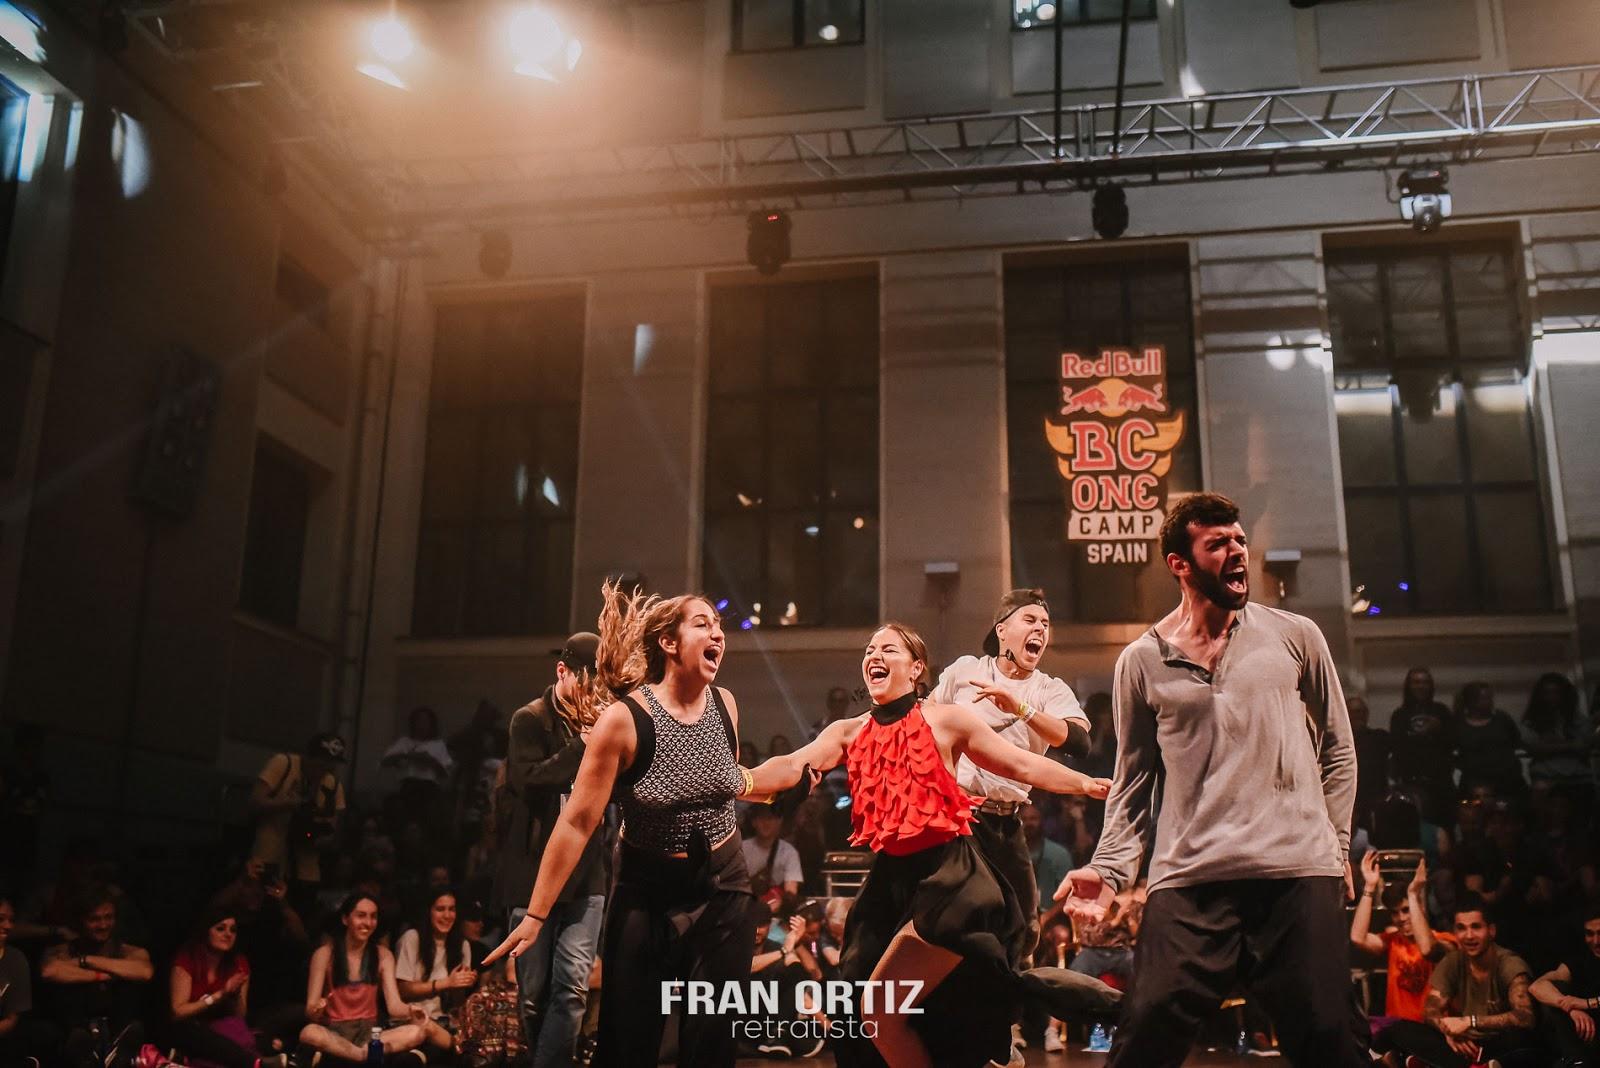 RED BULL BC ONE 2017 DIA 2 FOTOGRAFÍAS